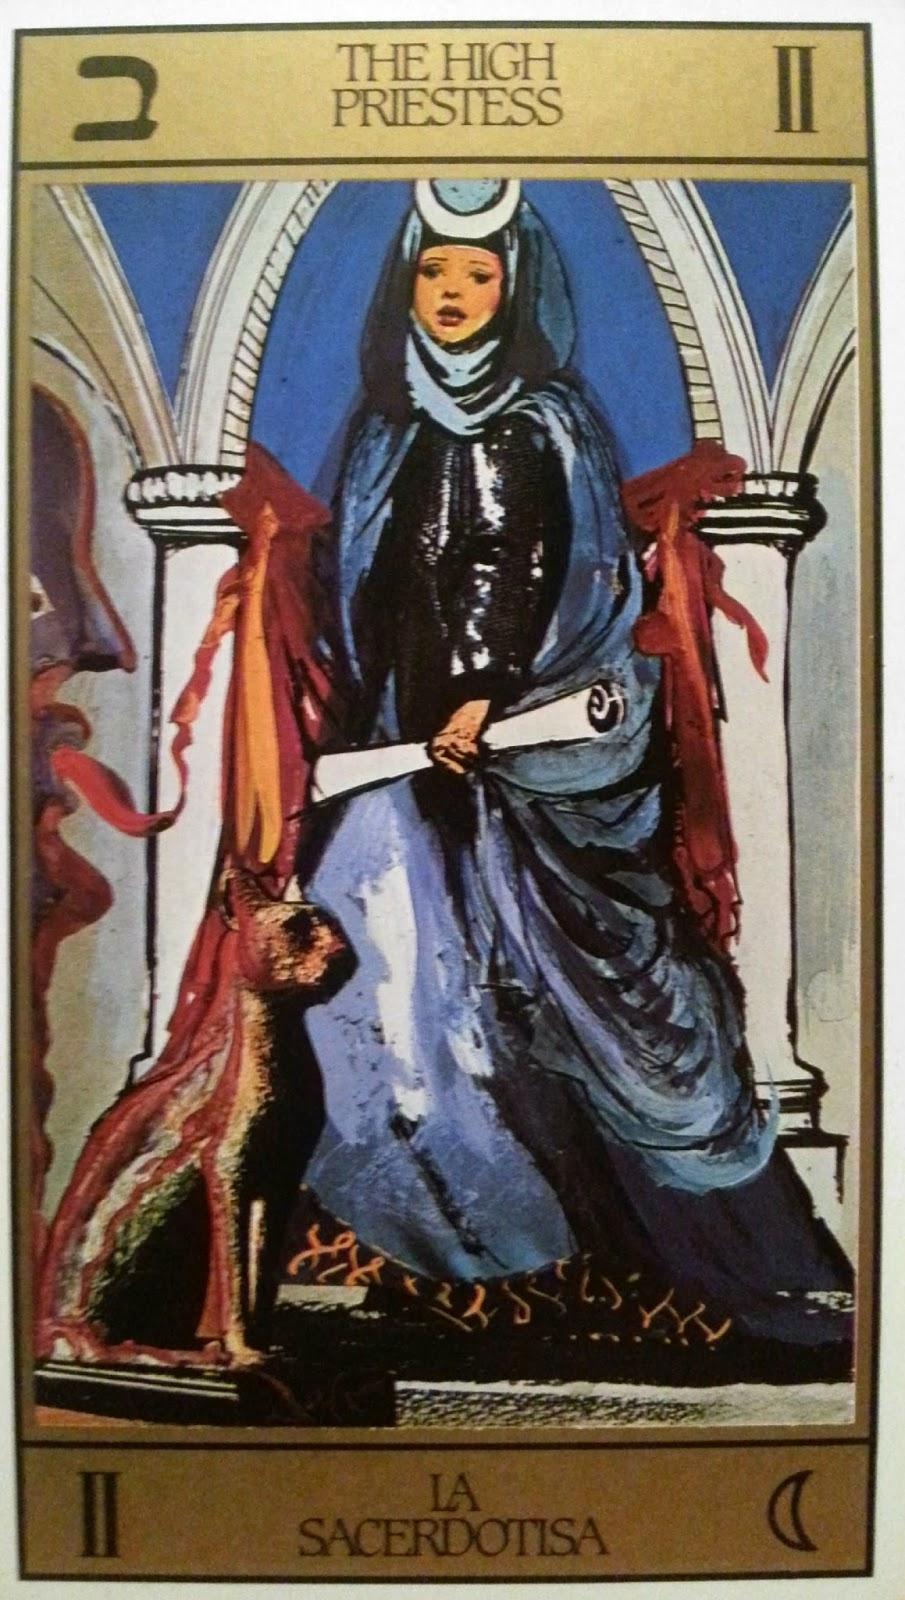 La Sacerdotisa. Tarot